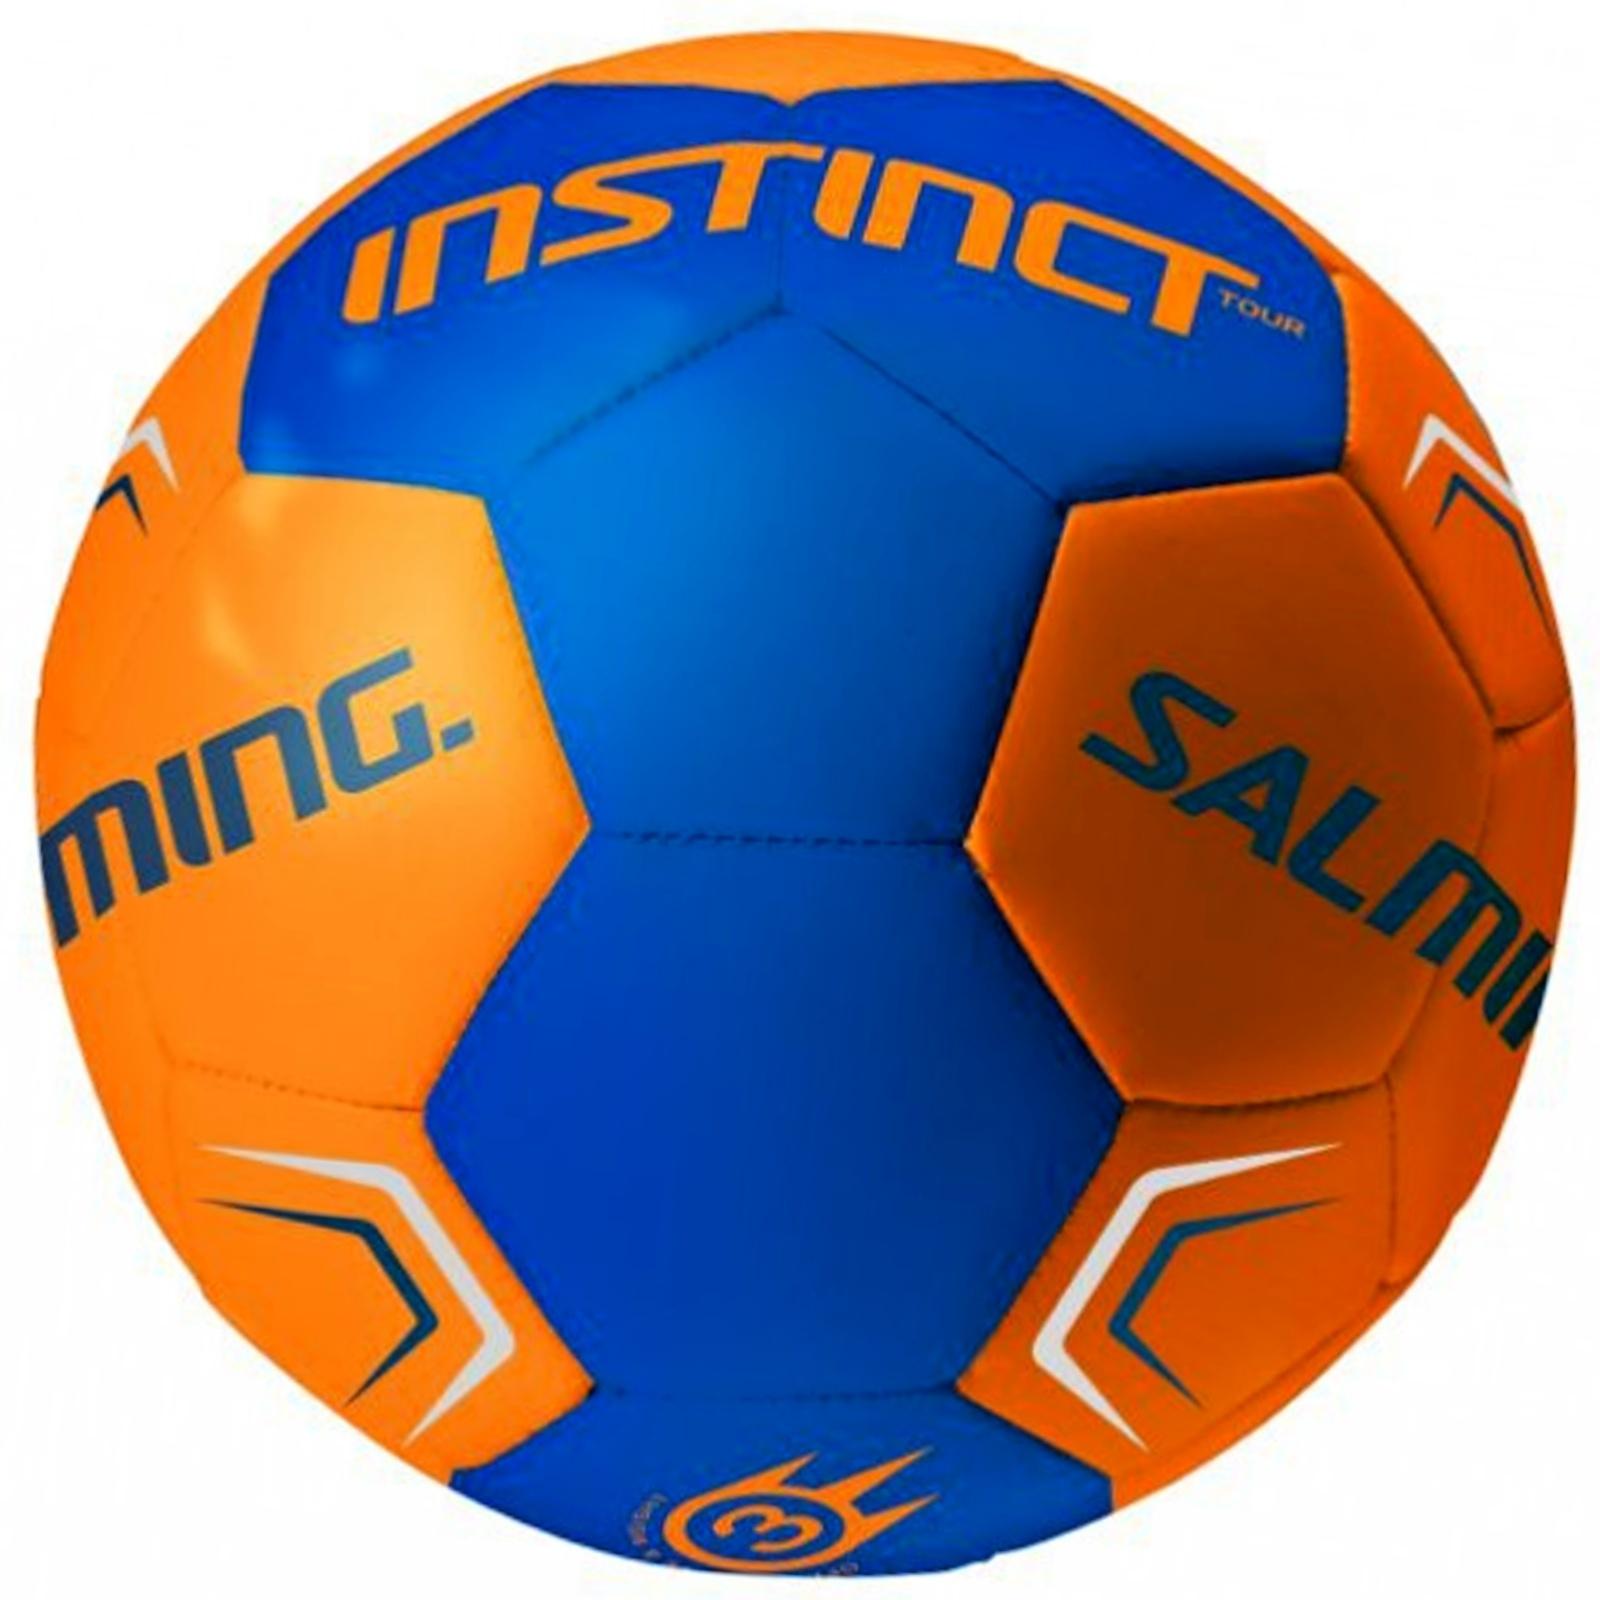 Míč házená SALMING Instinct Tour Handball 2, oranžovo-modrý